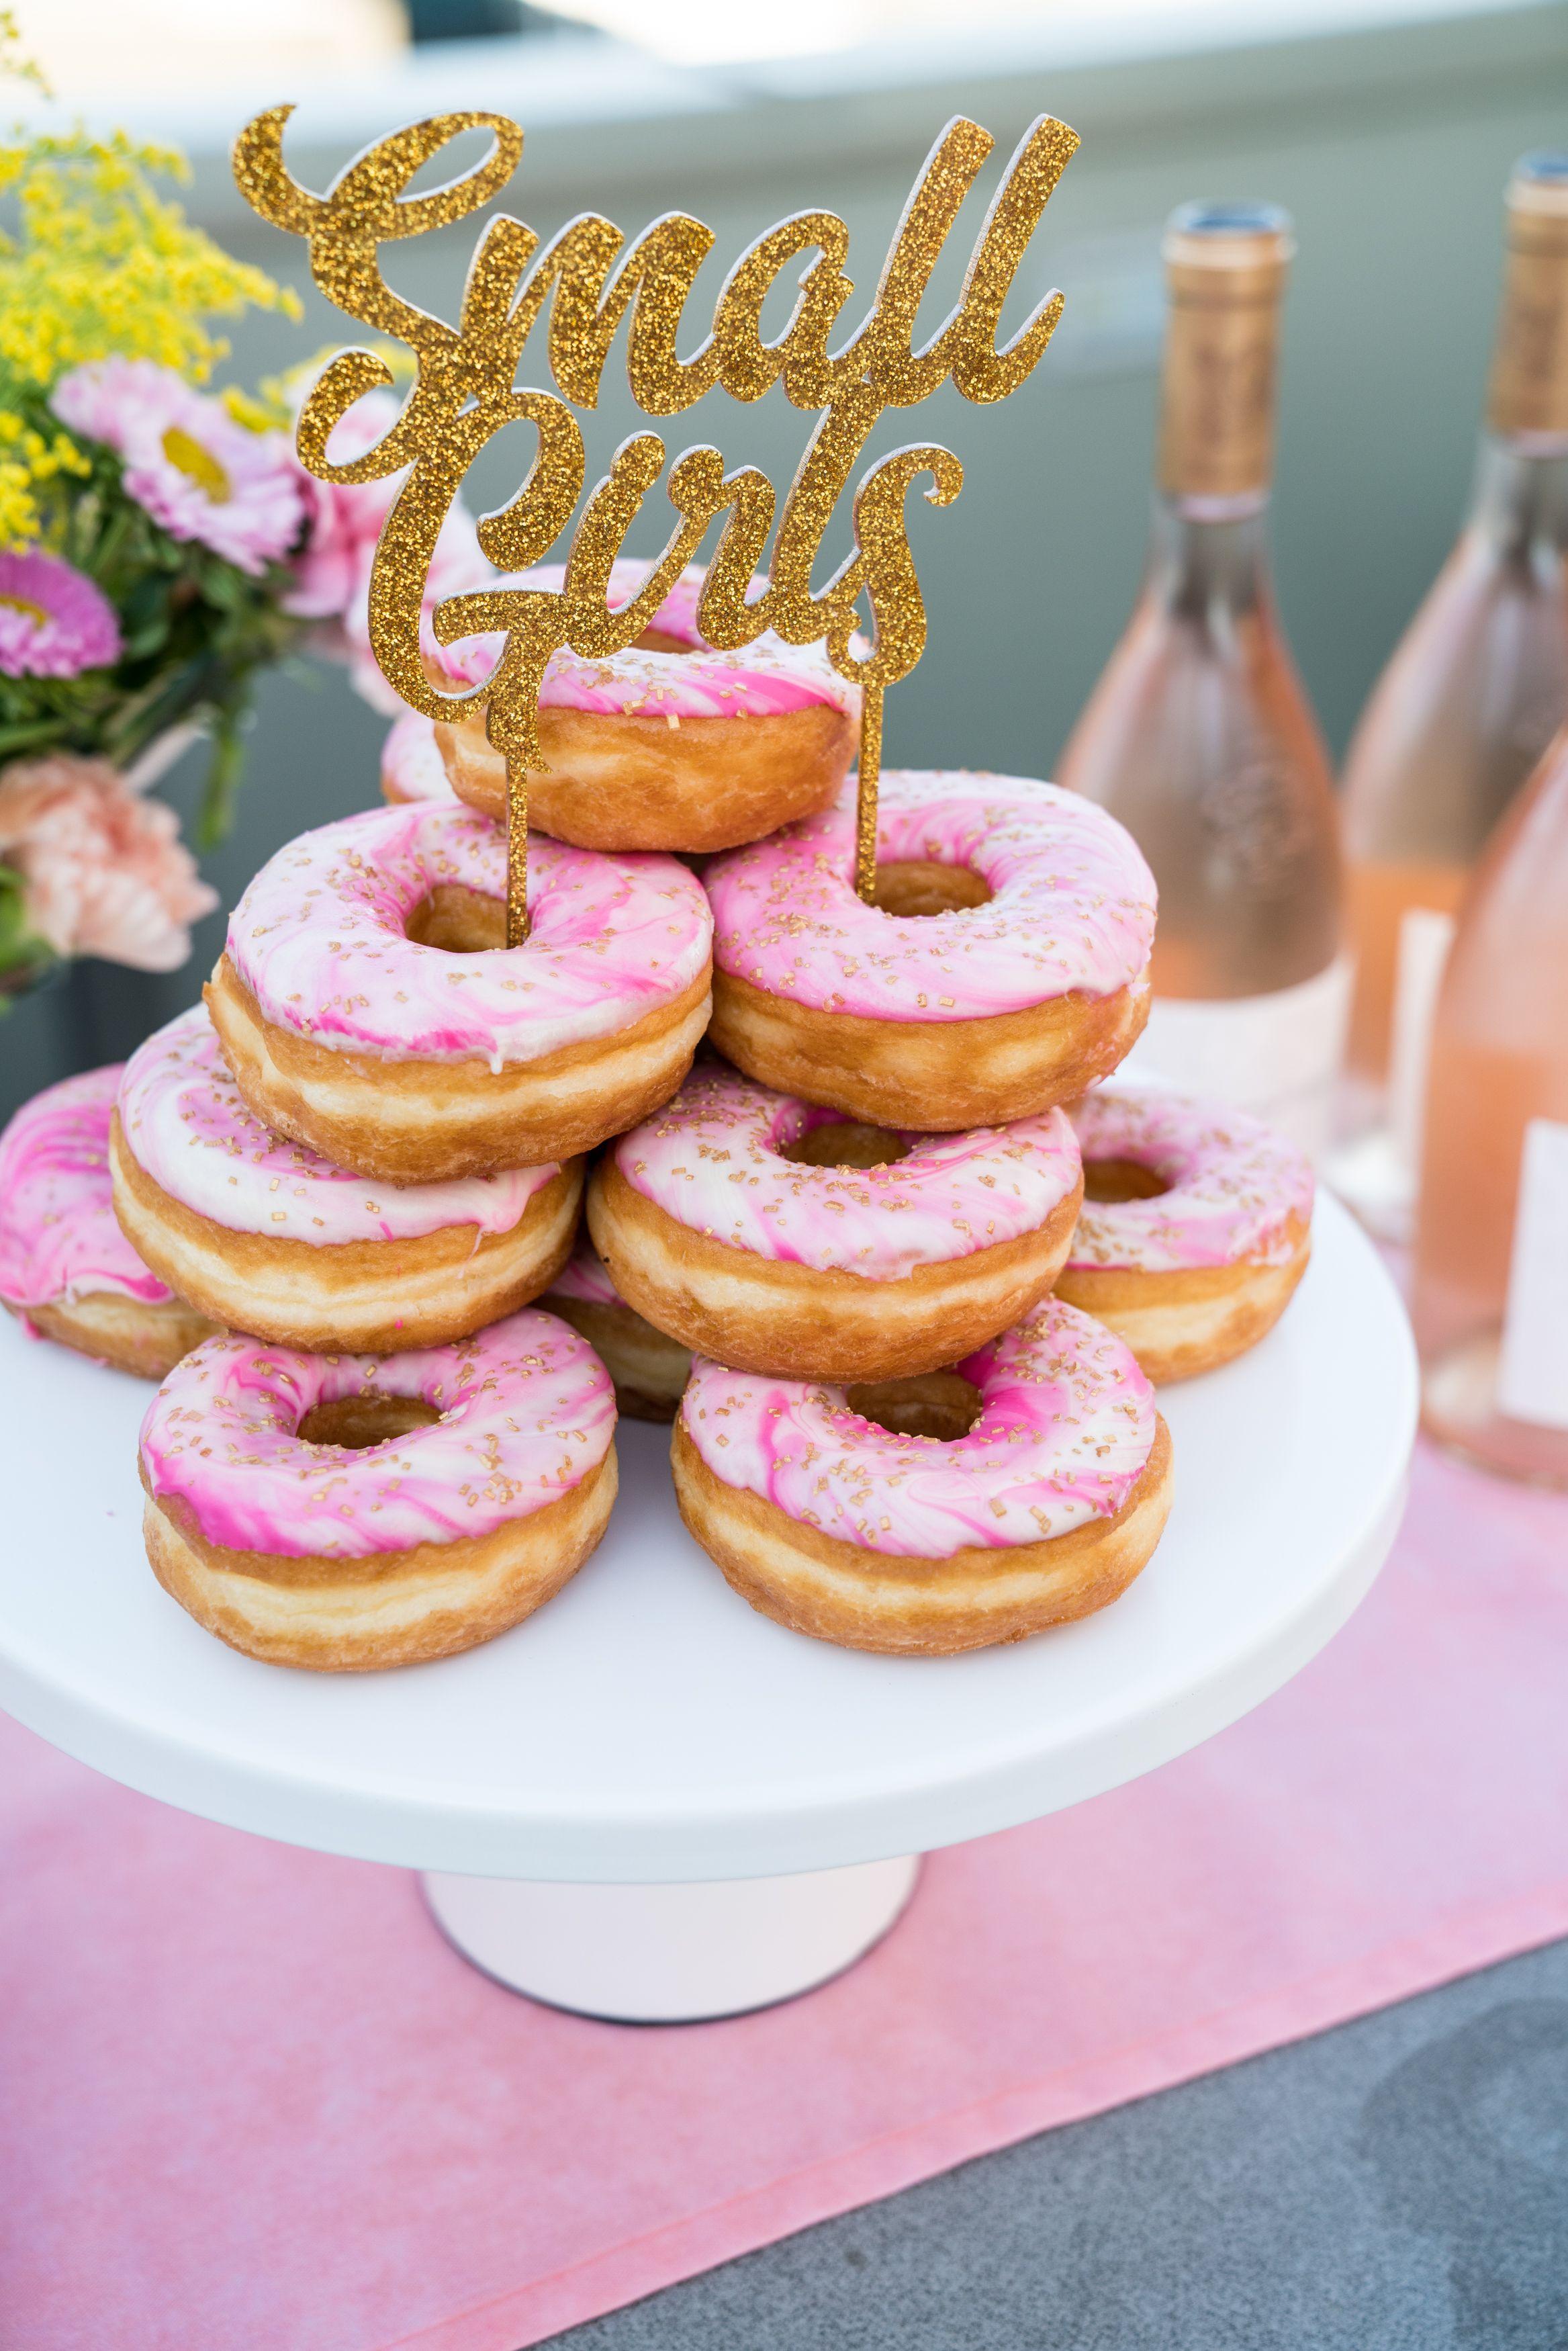 12 Inch Round Modern Metal Wedding Cake Stand (White) | Modern cakes ...